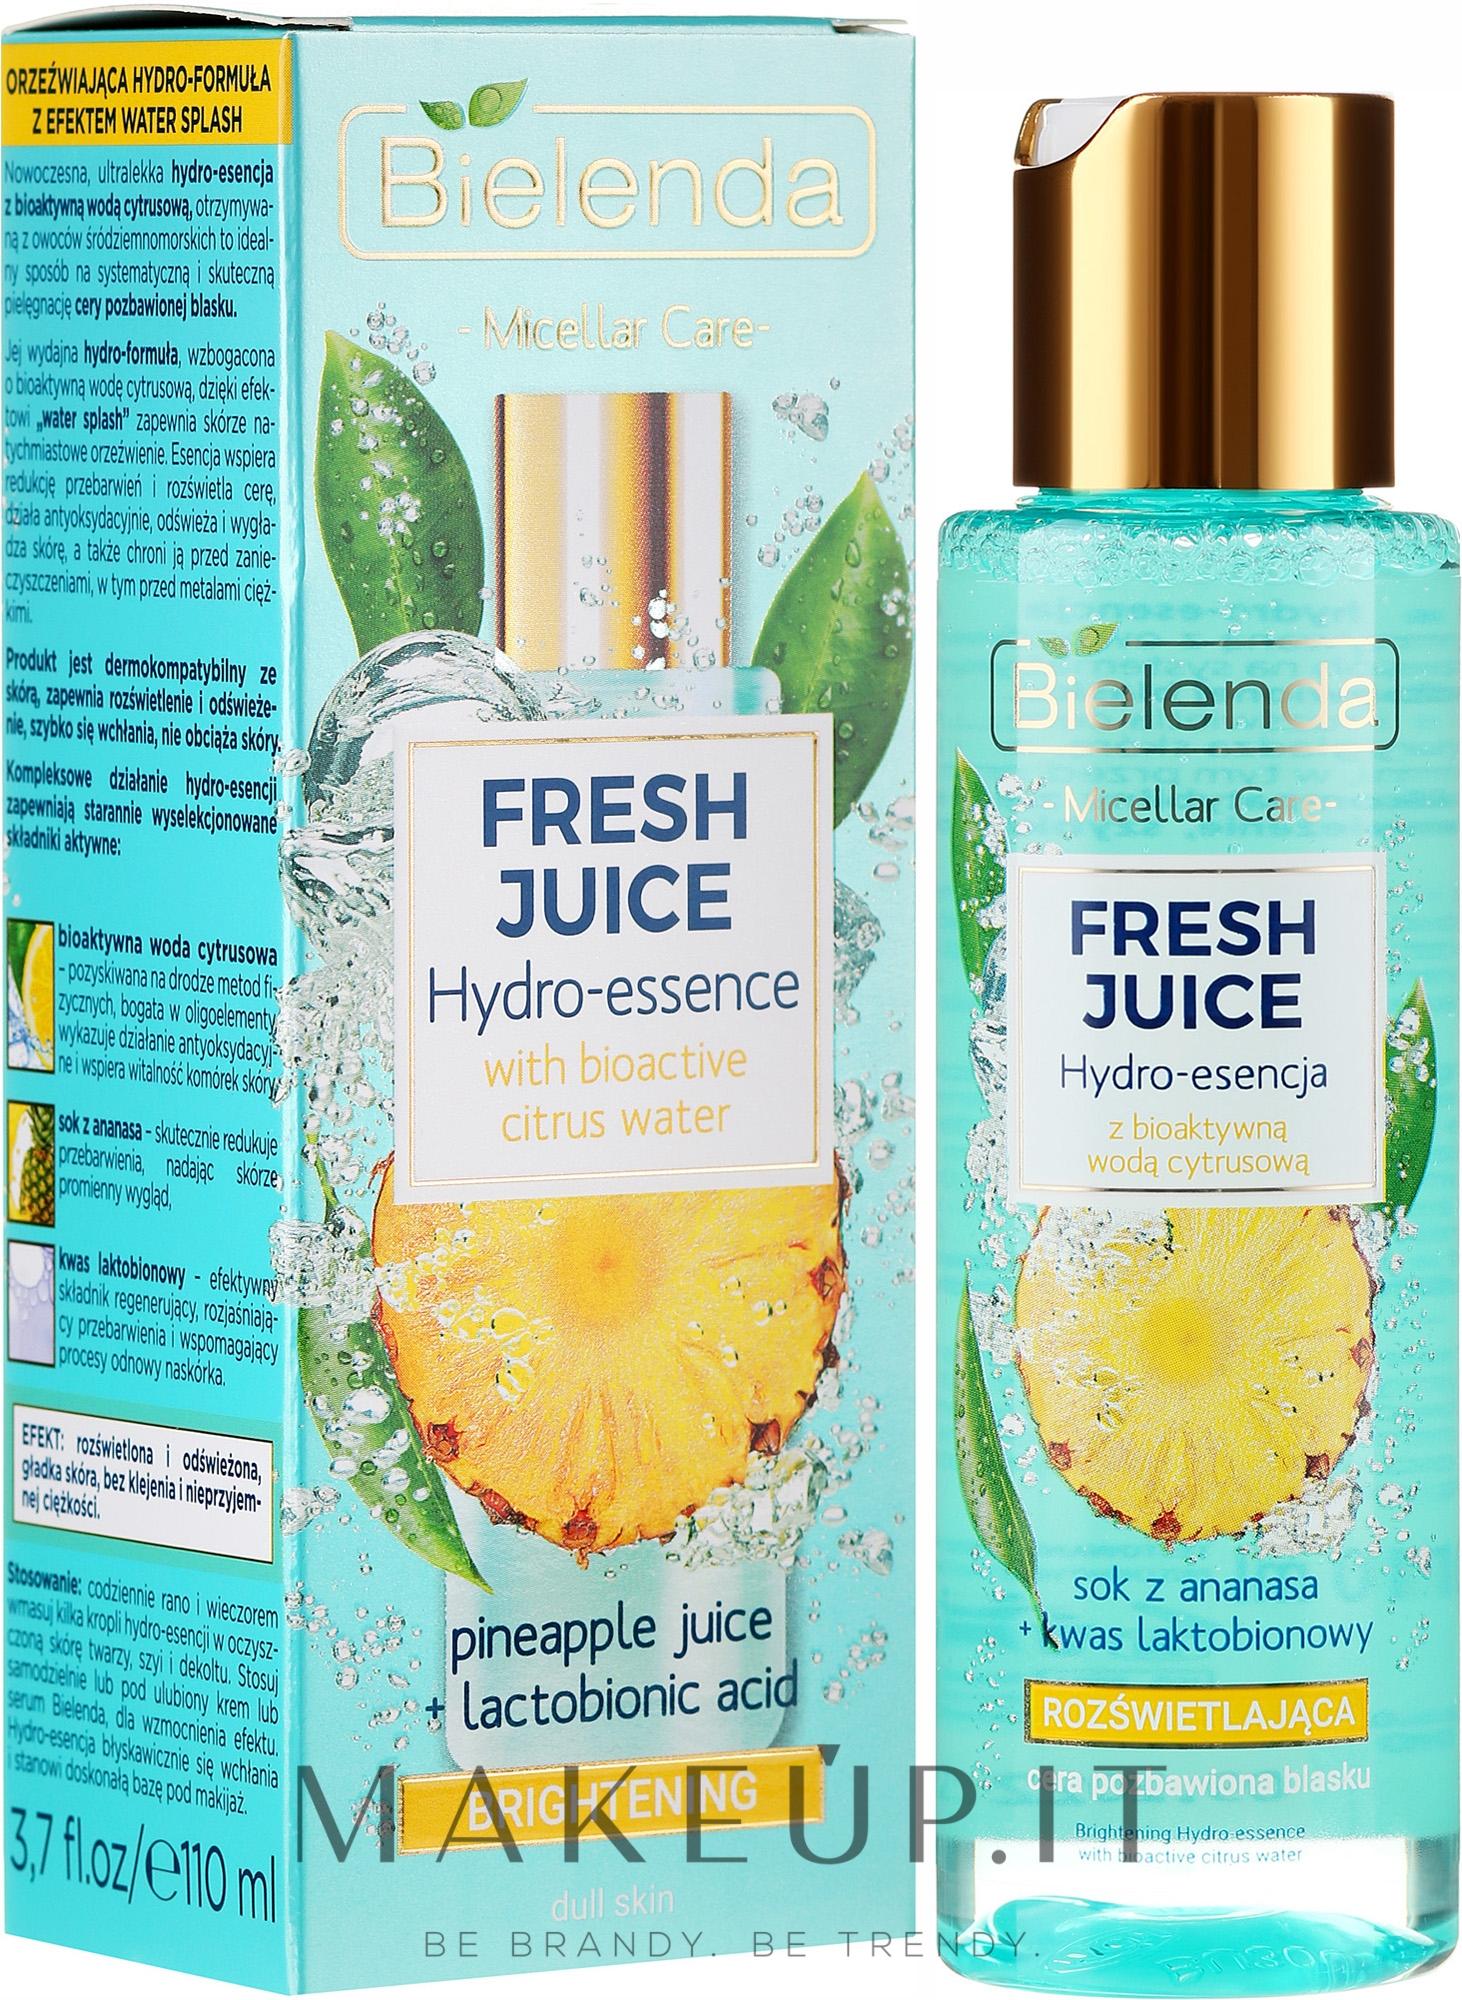 Idro-essenza illuminante - Bielenda Fresh Juice Brightening Hydro Essence Pineapple — foto 110 ml